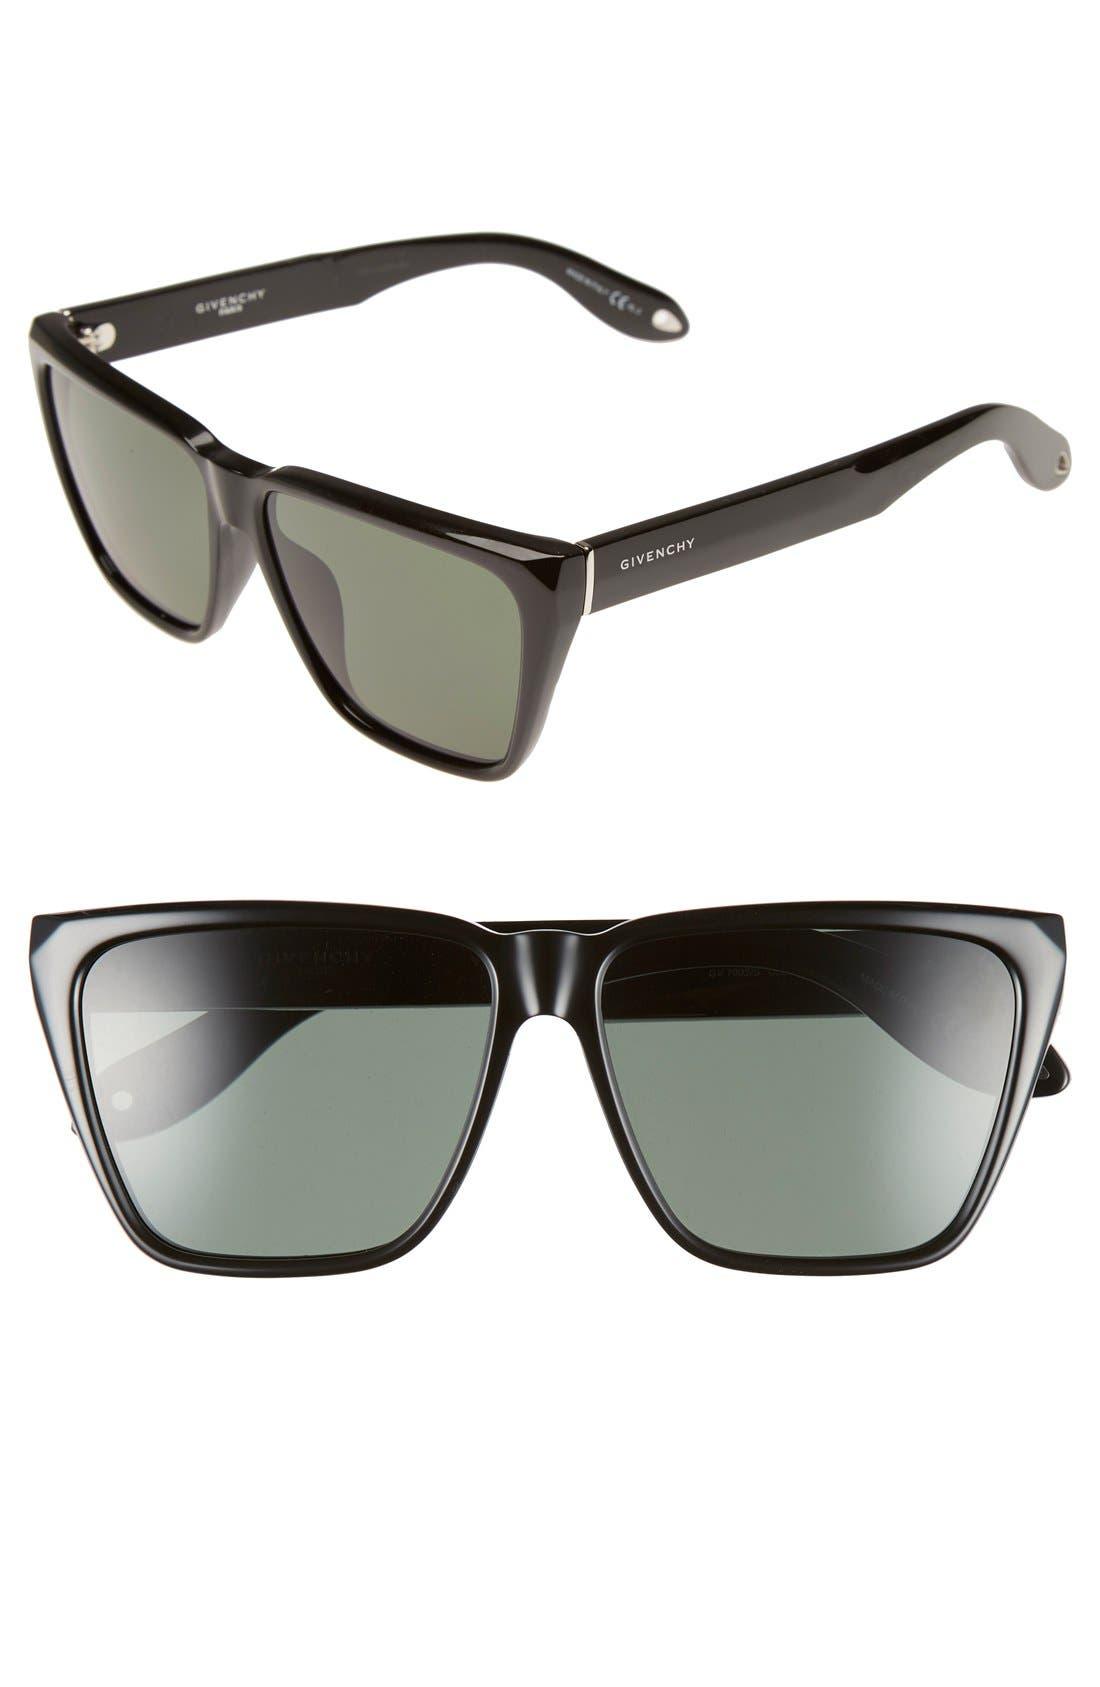 58mm Flat Top Sunglasses,                         Main,                         color, Black/ Grey Green